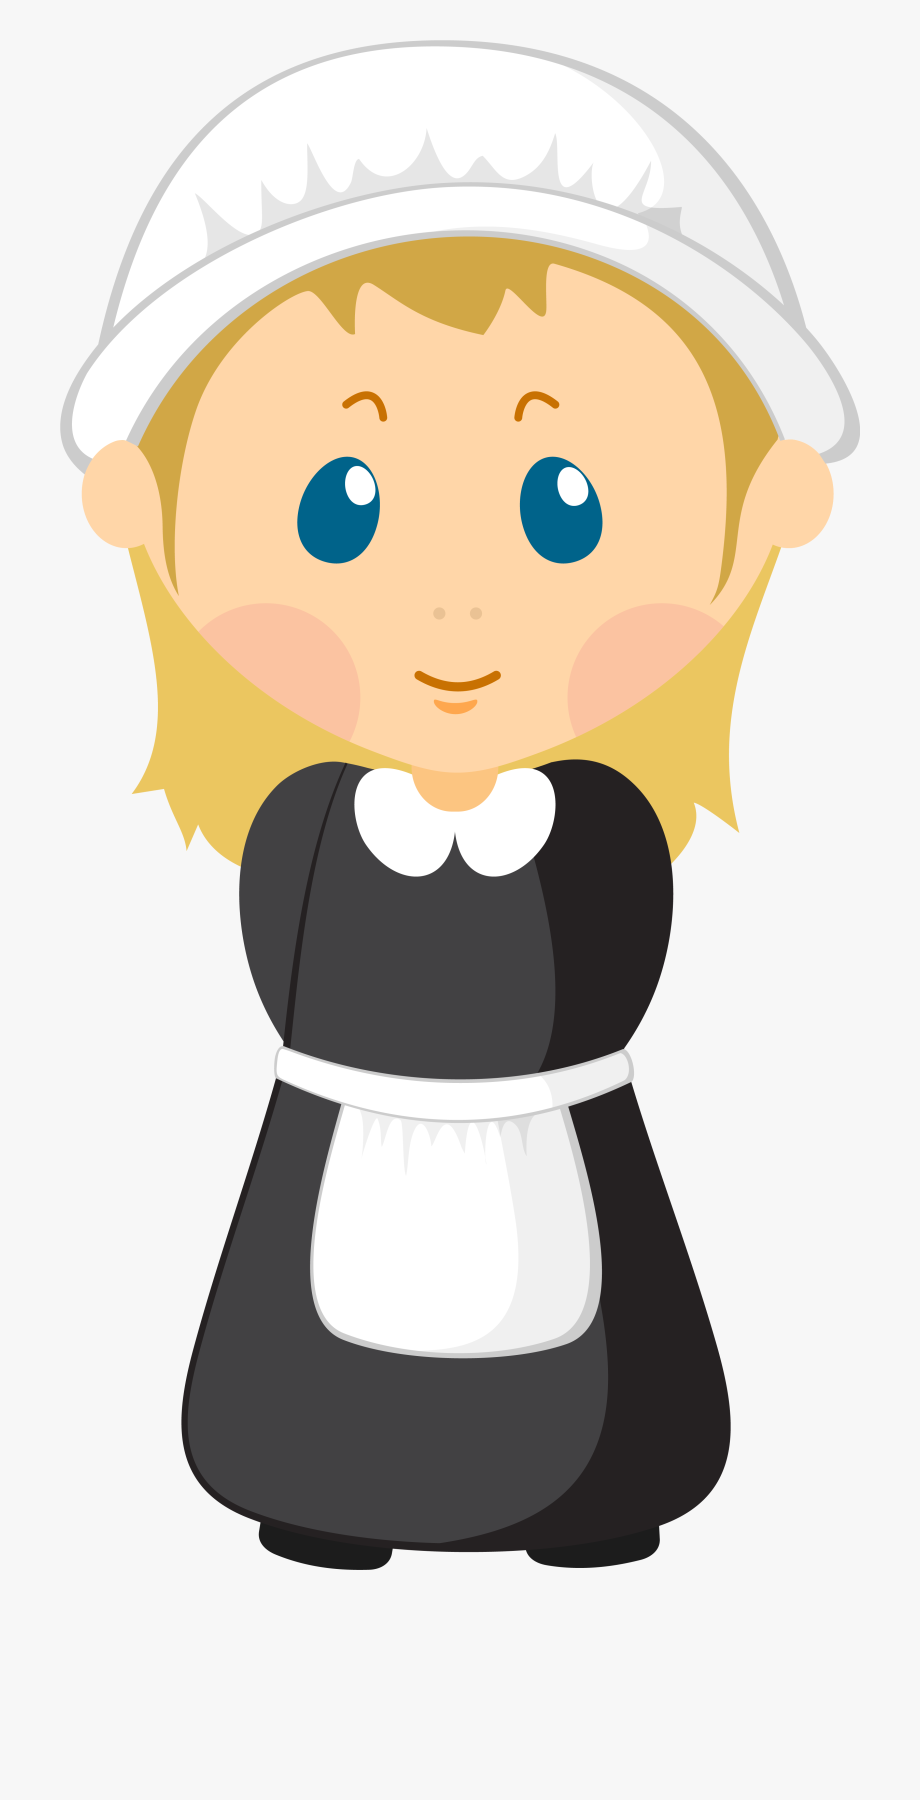 Girl png imageu b. Pilgrim clipart colonist